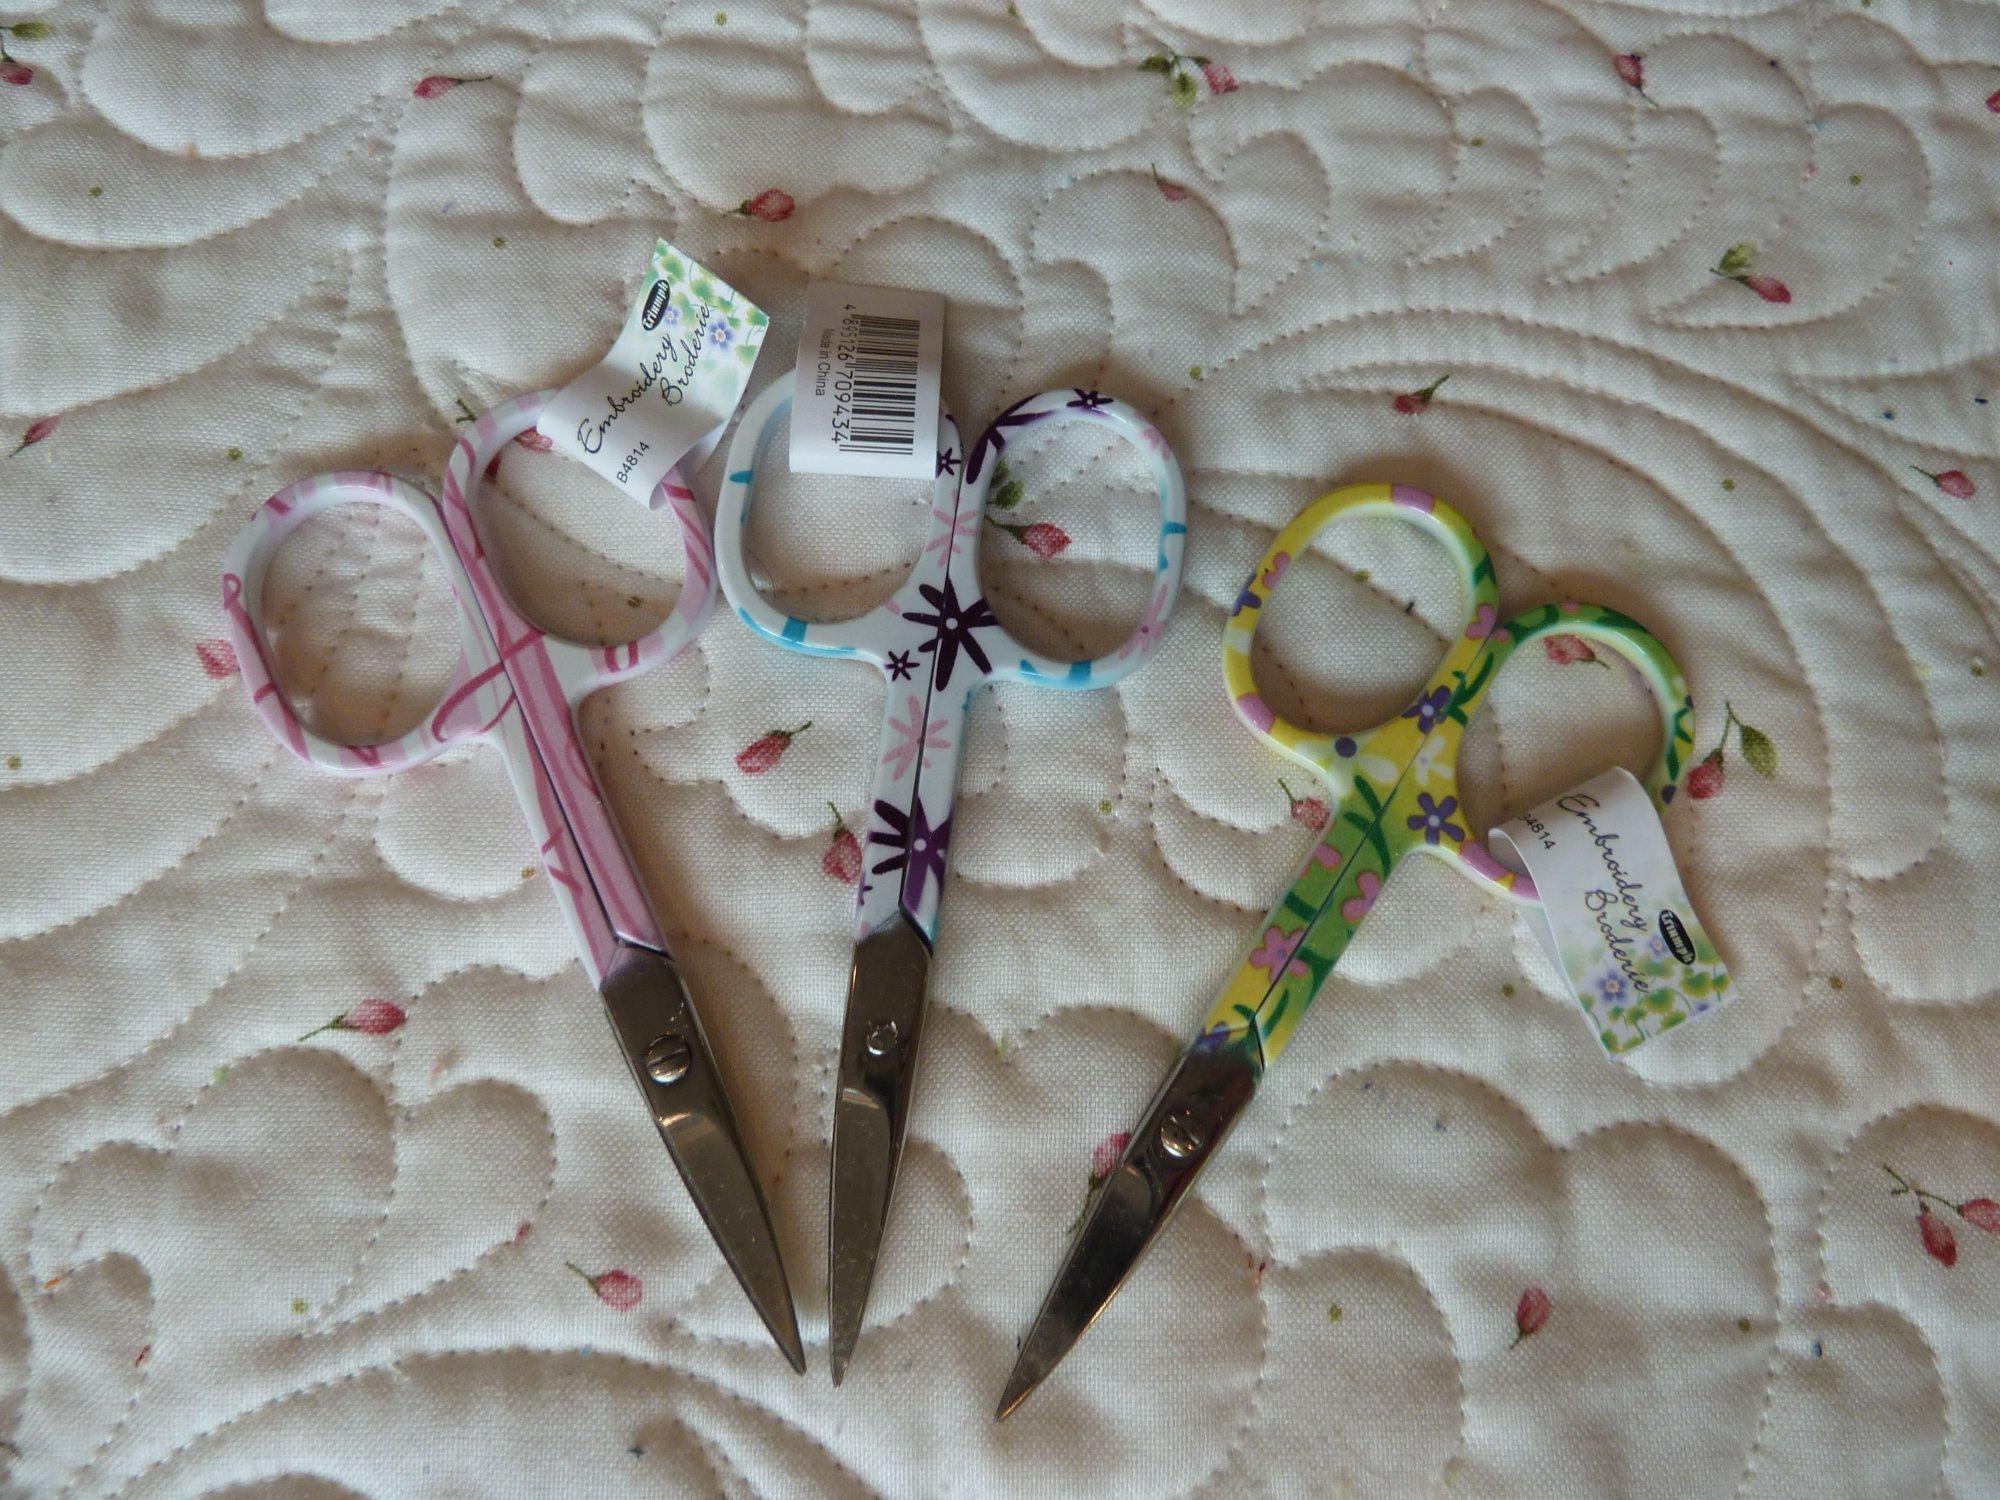 Scissors: Sharp and Small